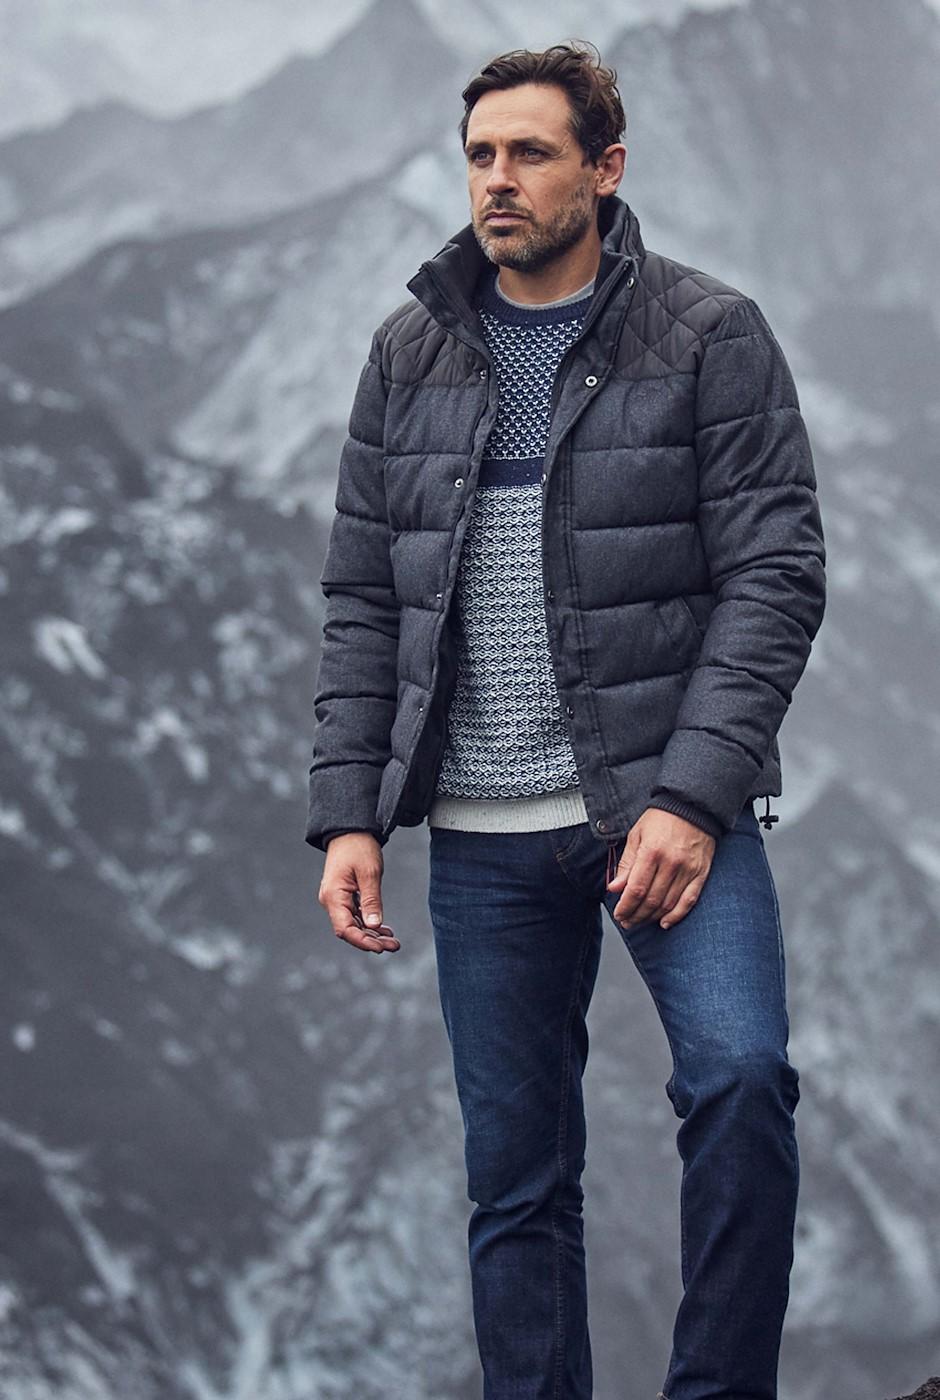 Bryson Melange Puffa Jacket Charcoal